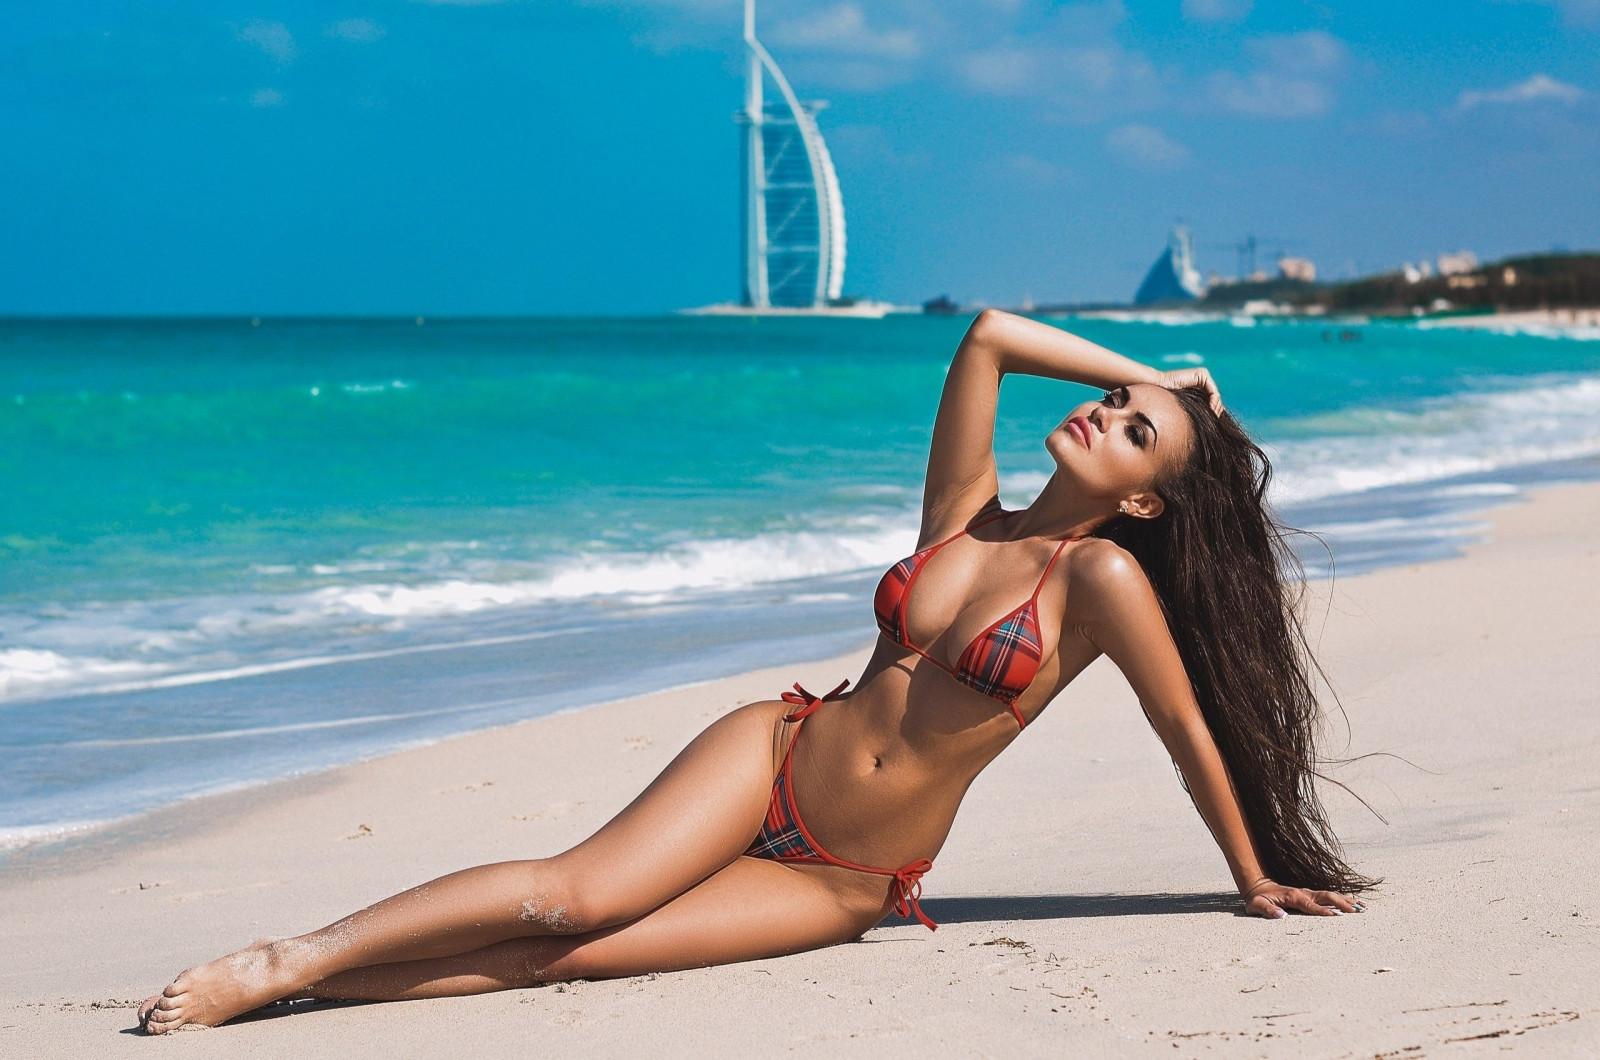 пляж и девушки фото-тн2